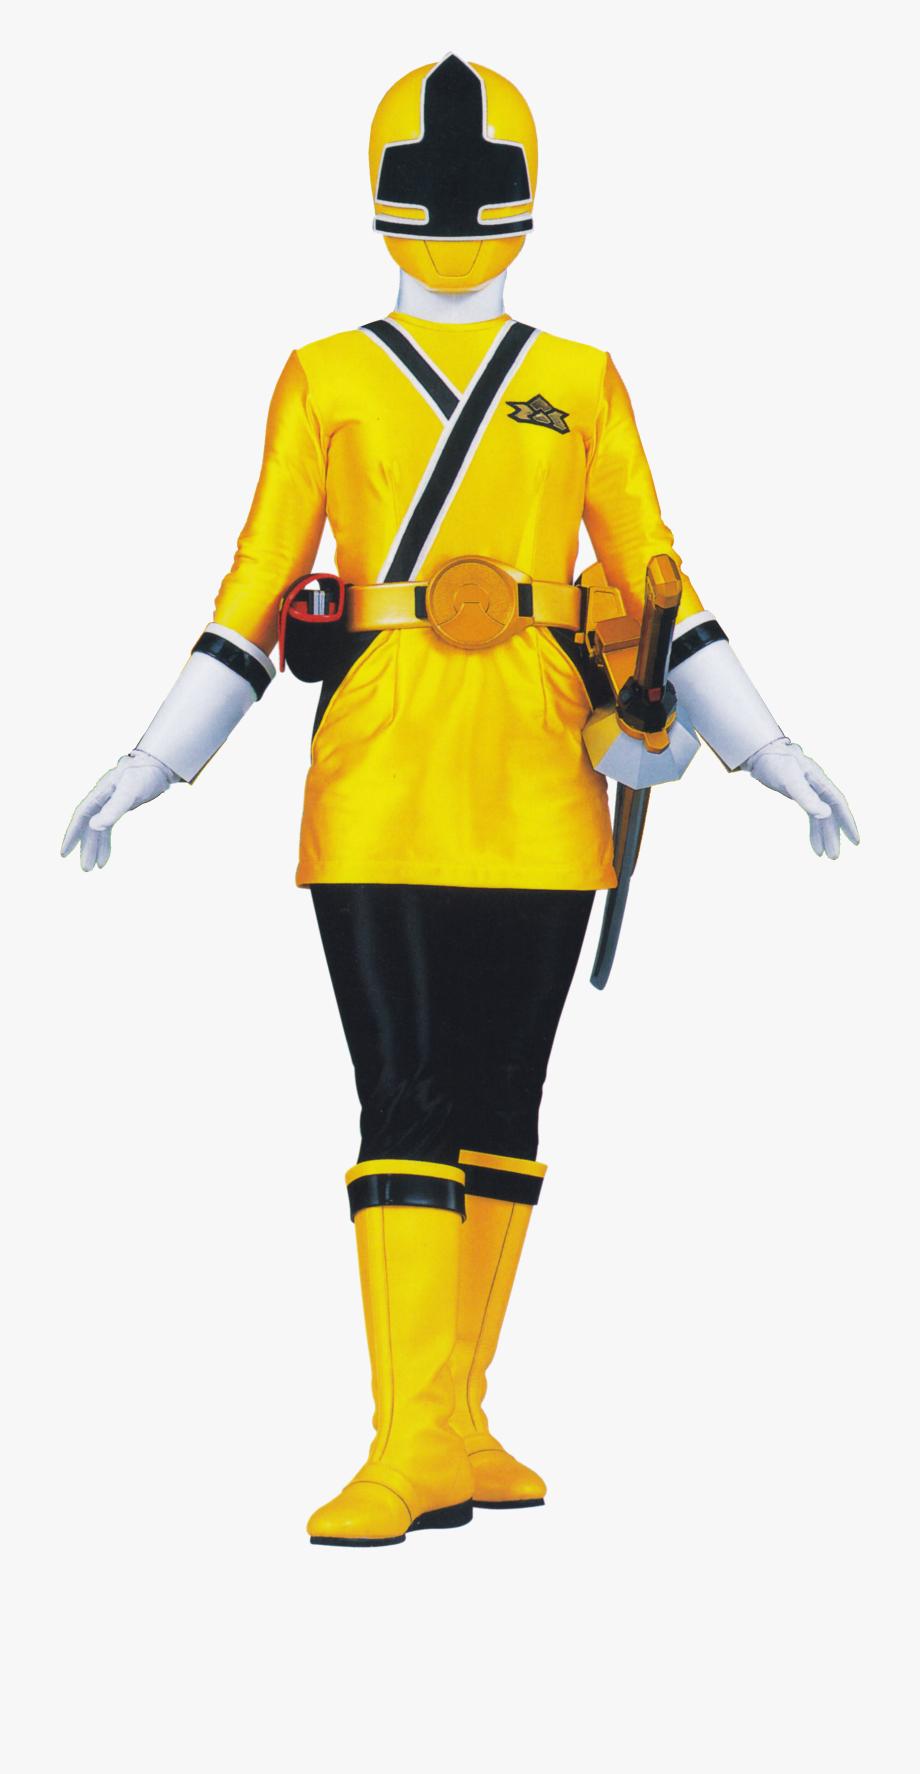 Power Ranger Samurai Yellow , Transparent Cartoon, Free.